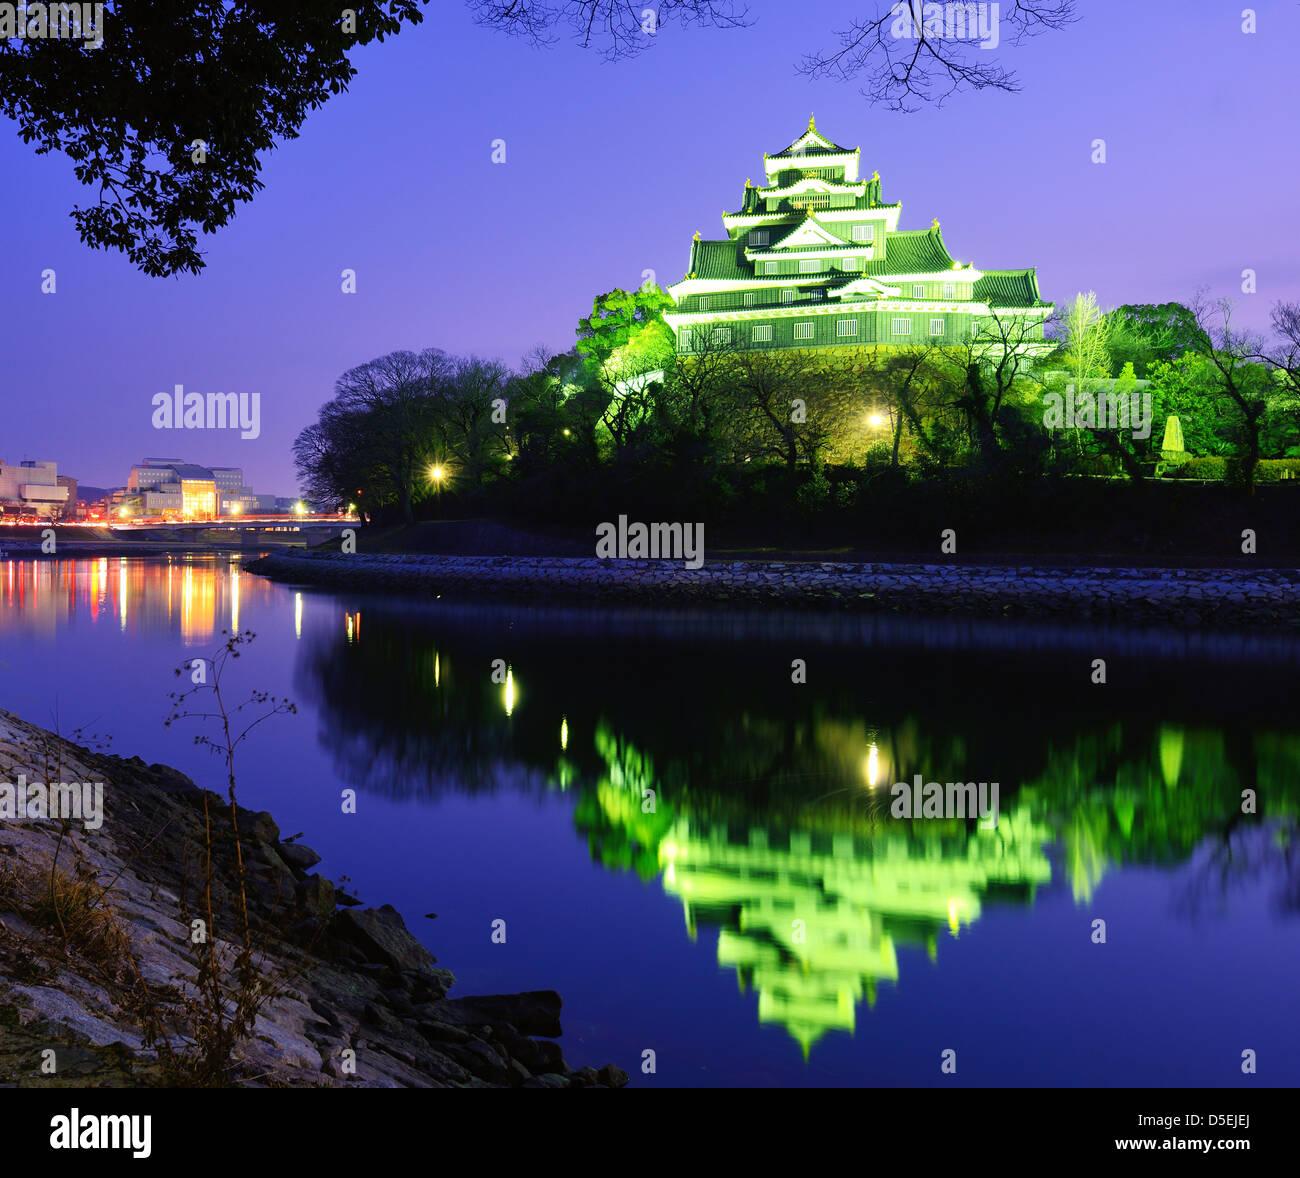 Okayama Castle in Okayama Japan. - Stock Image